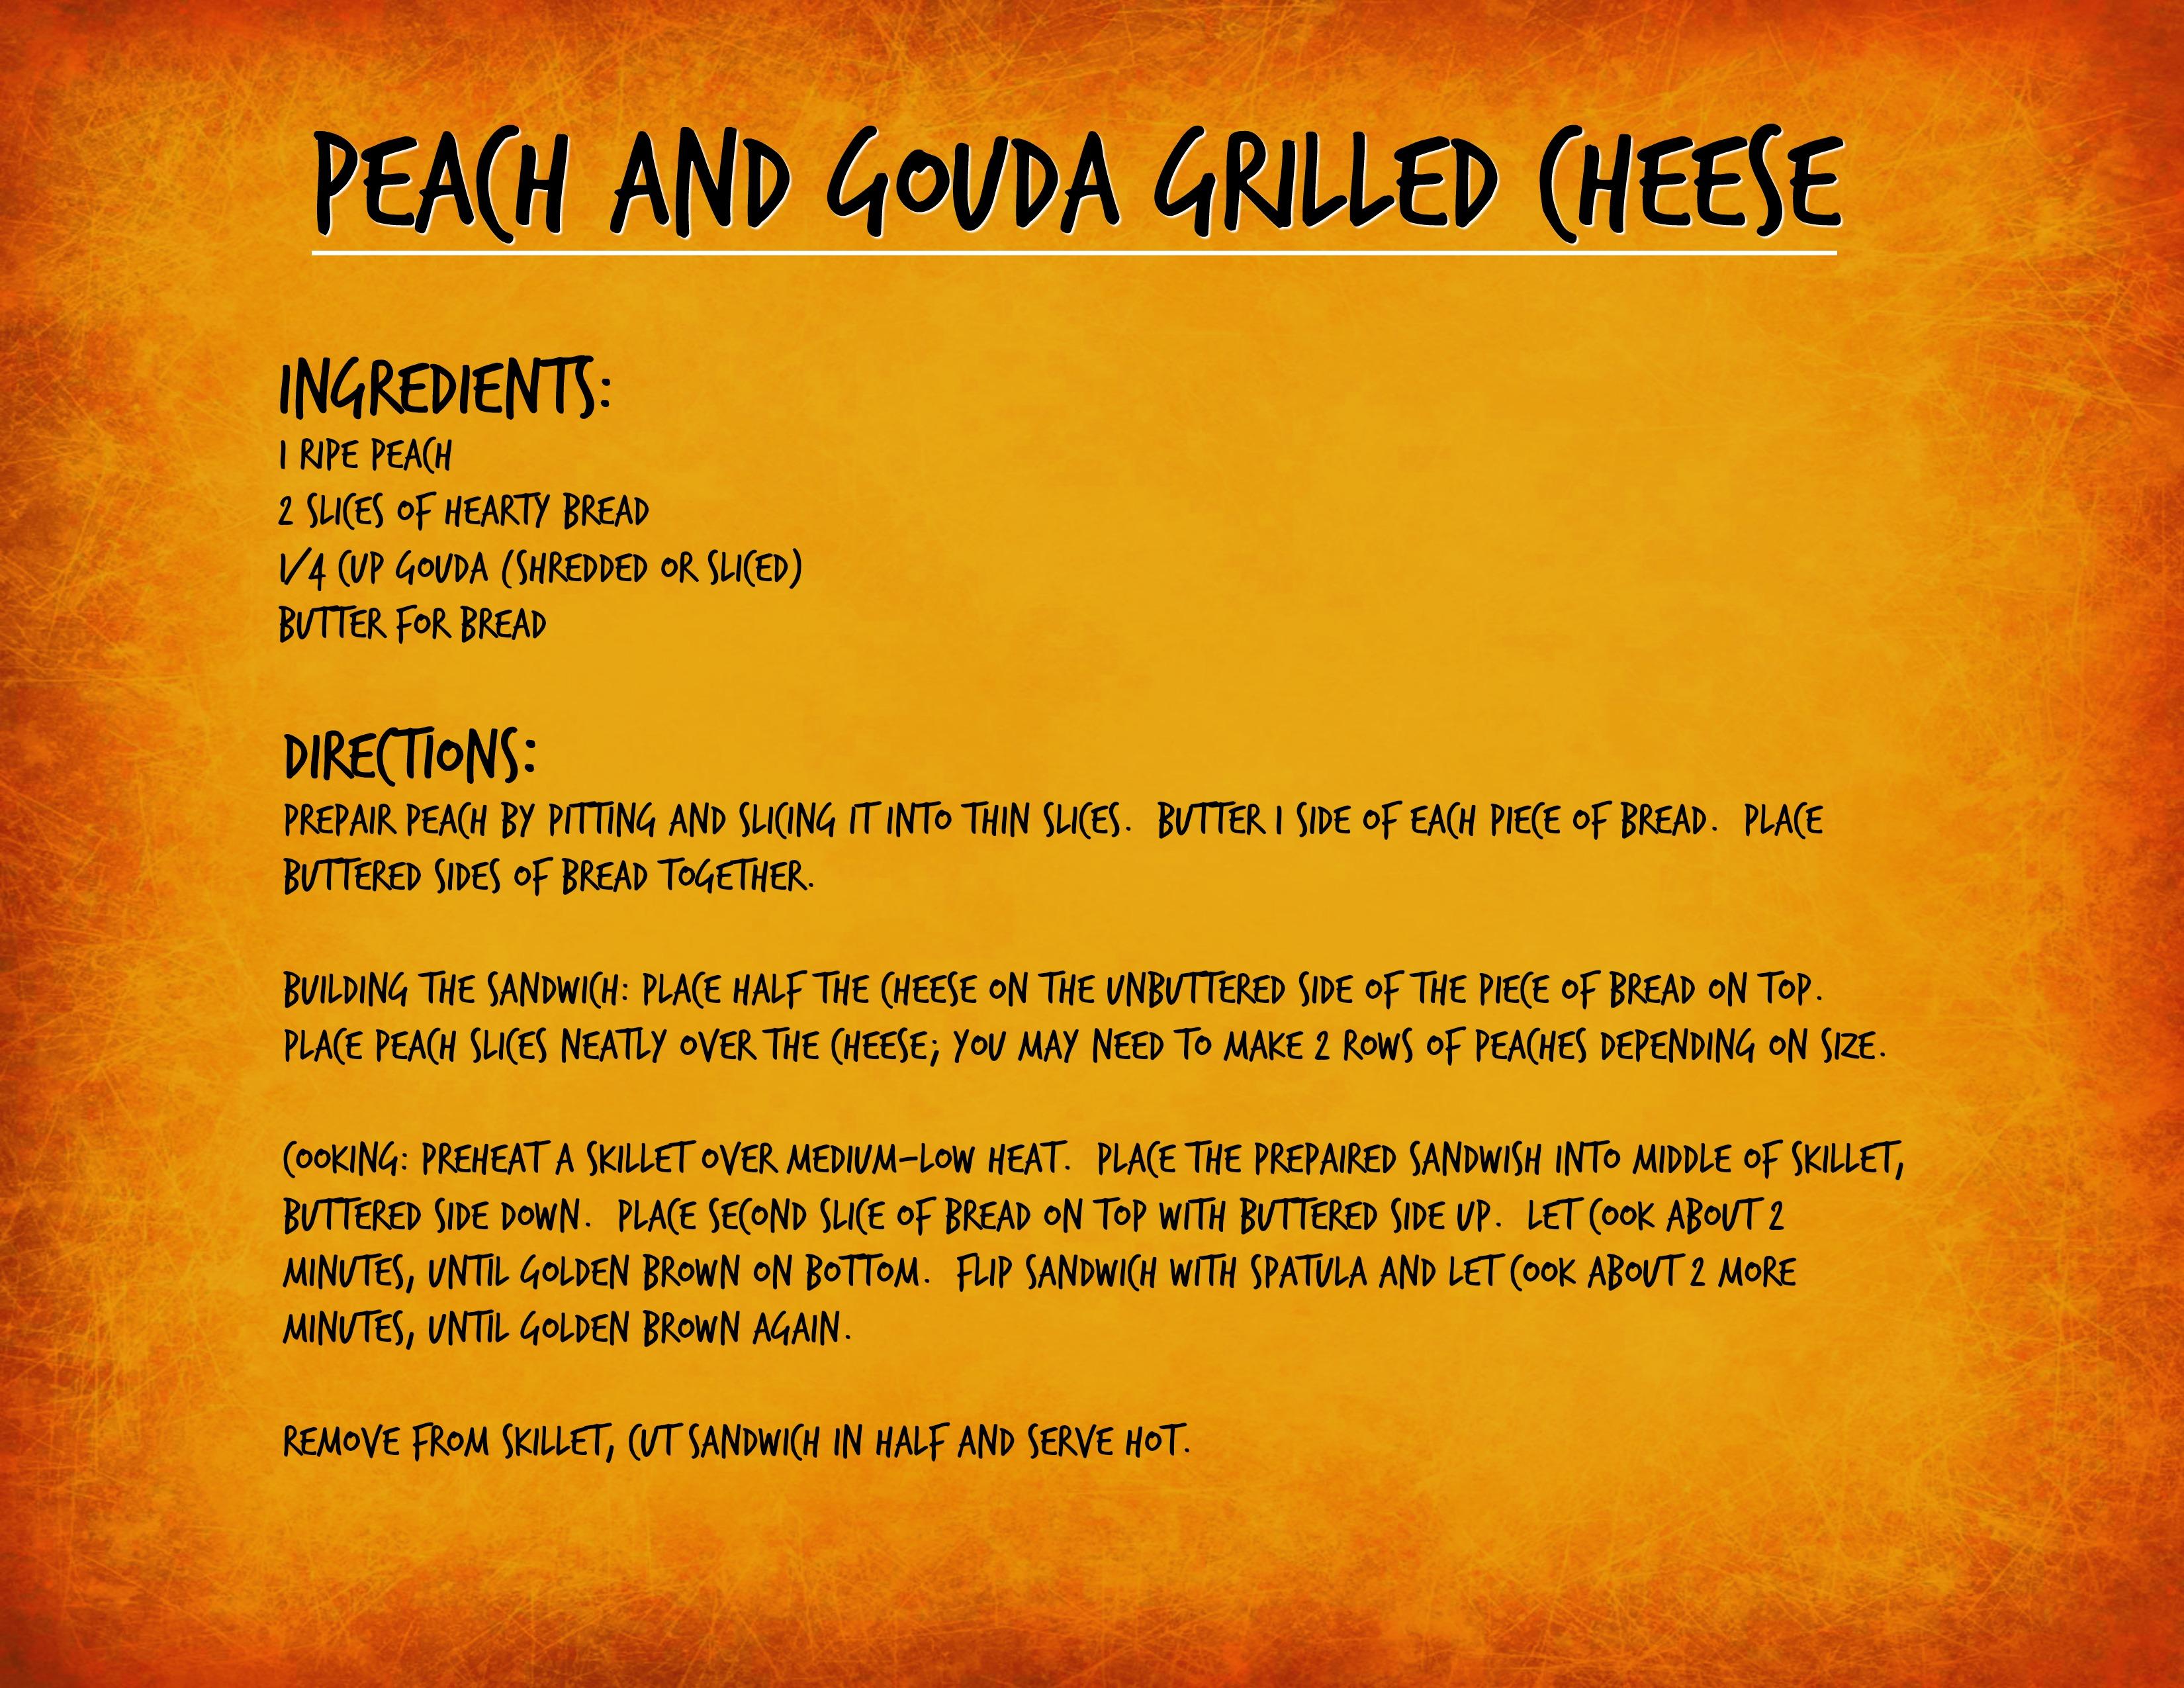 Peach and Gouda Recipe